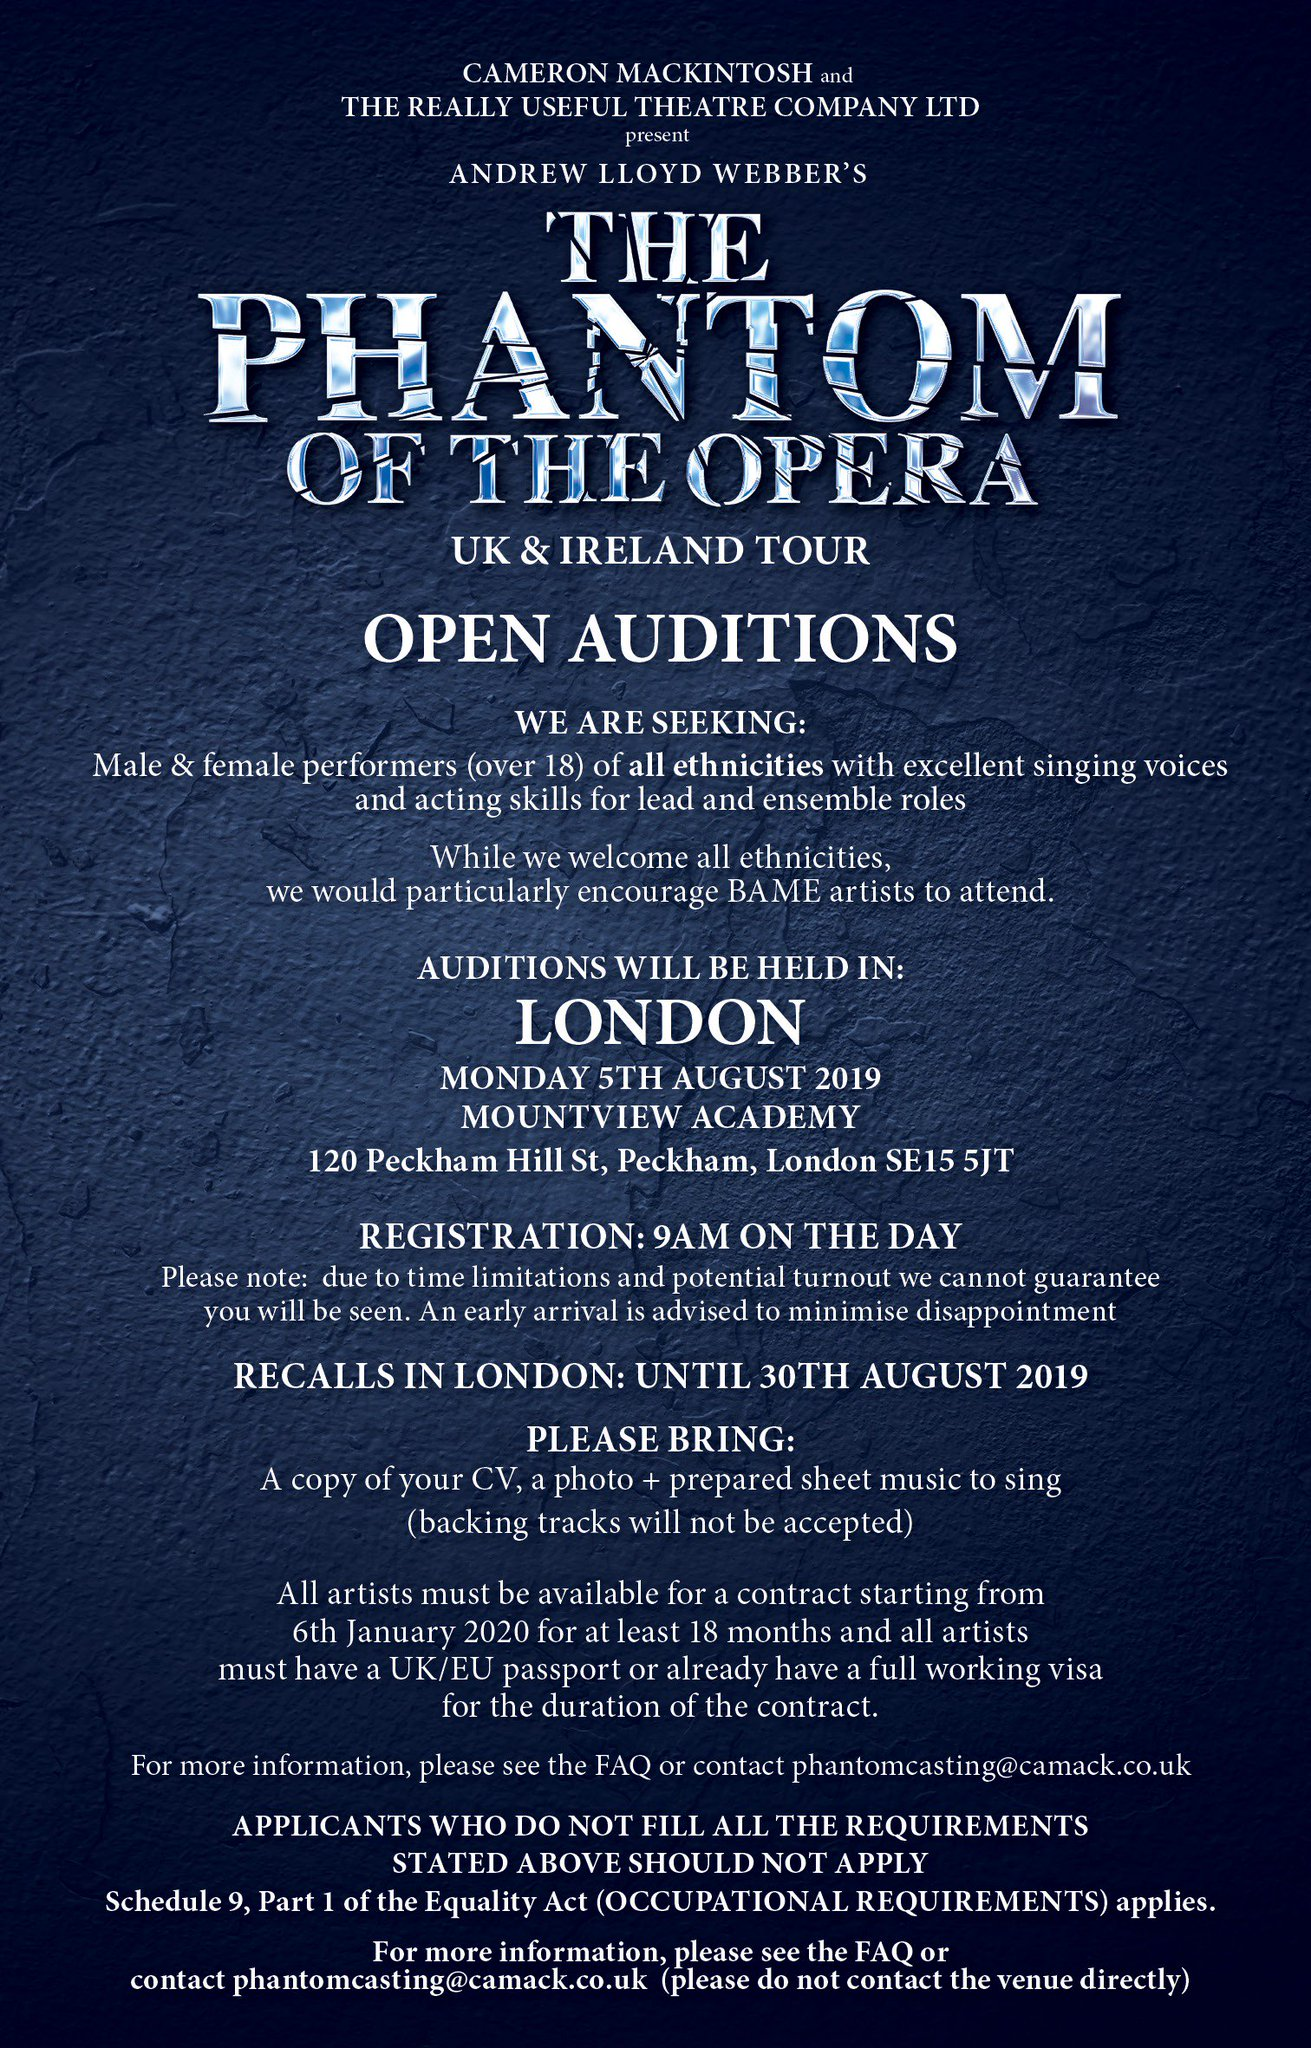 The Phantom Of The Opera on Twitter: